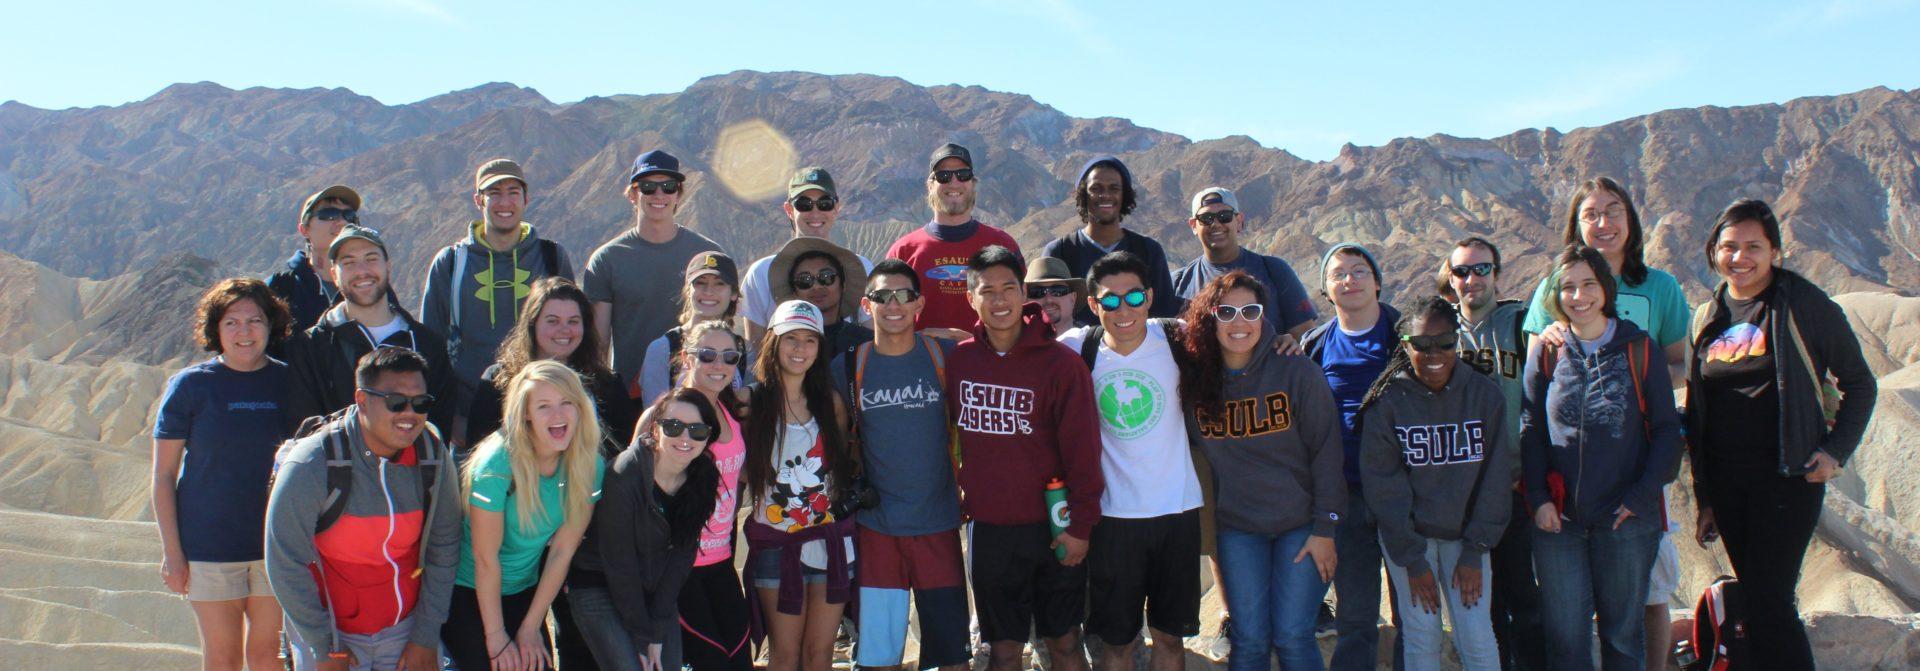 Desert Field Trip